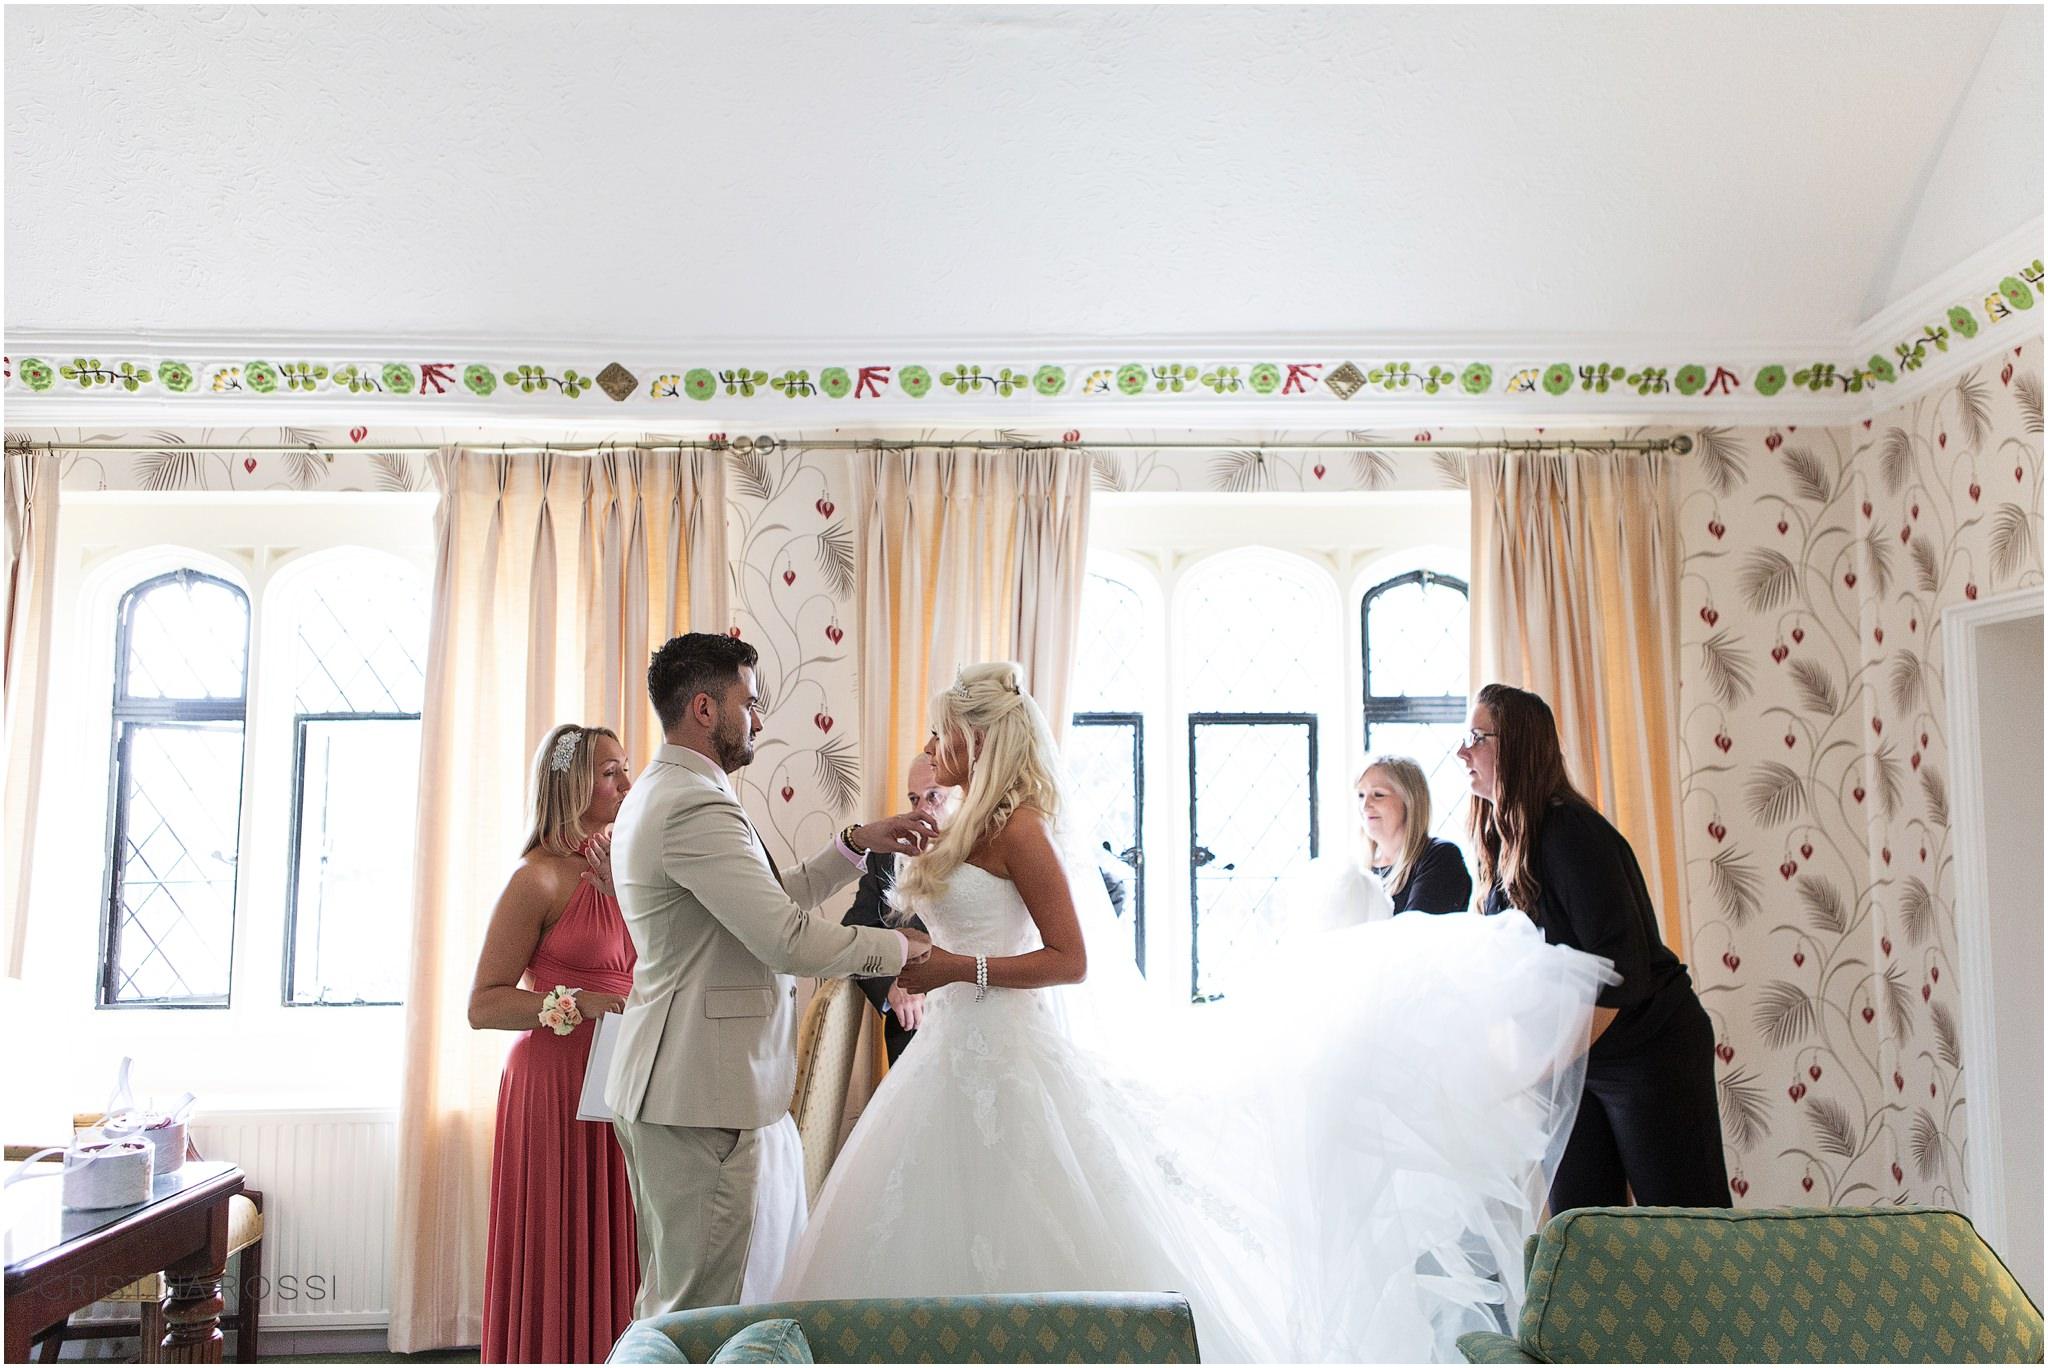 Eastwell Manor Neil Razor Ruddock & Leah Newman wedding_0078